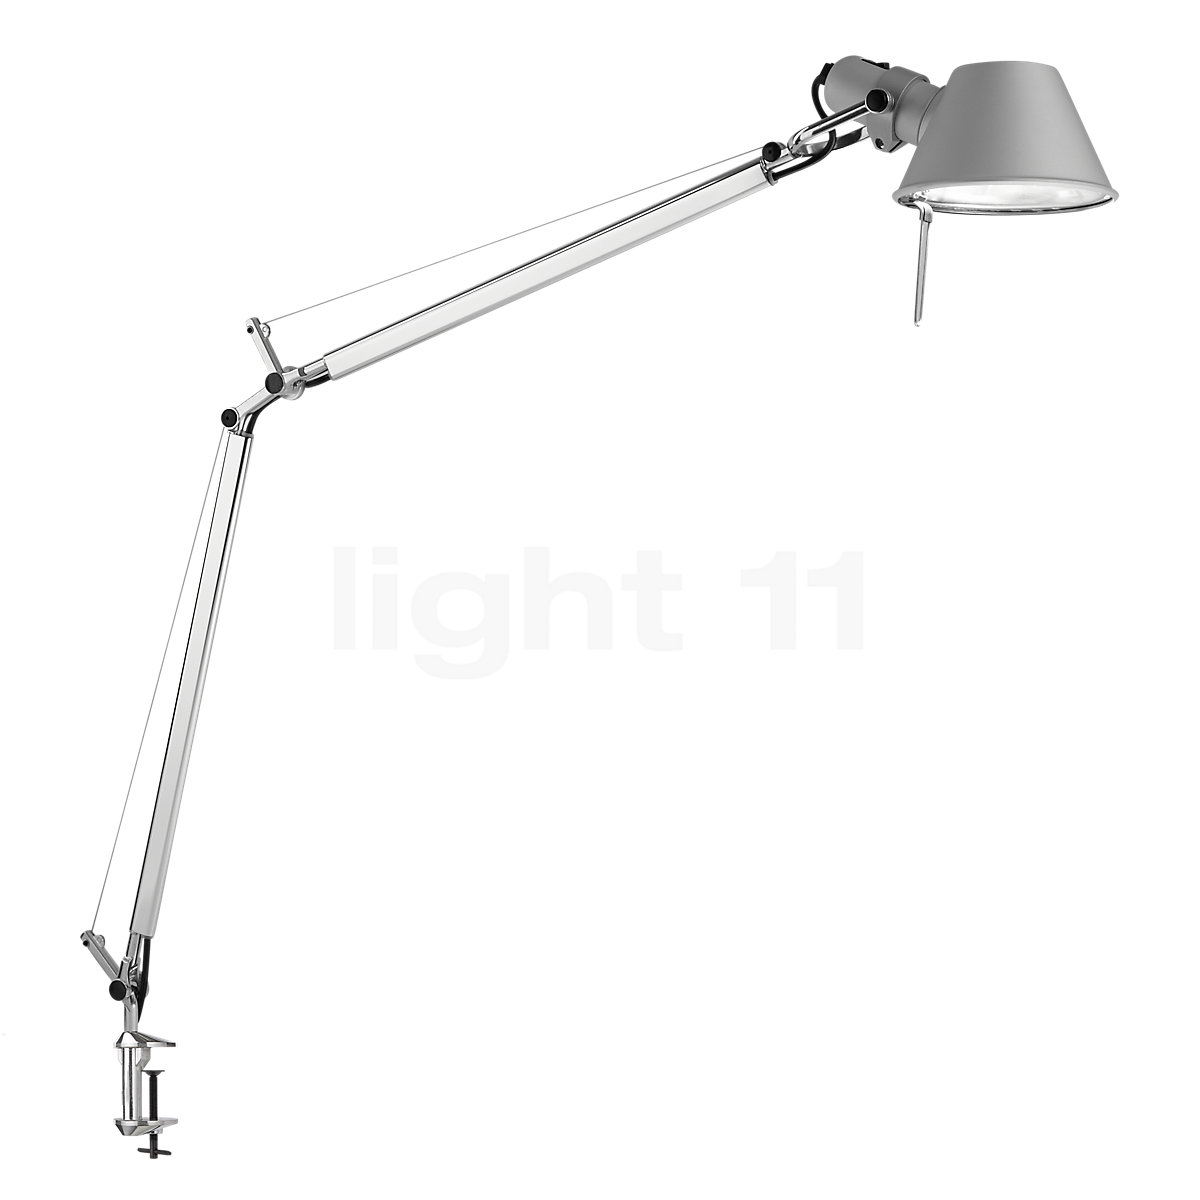 Artemide Tolomeo Tavolo LED mit Tischklemme light11.at